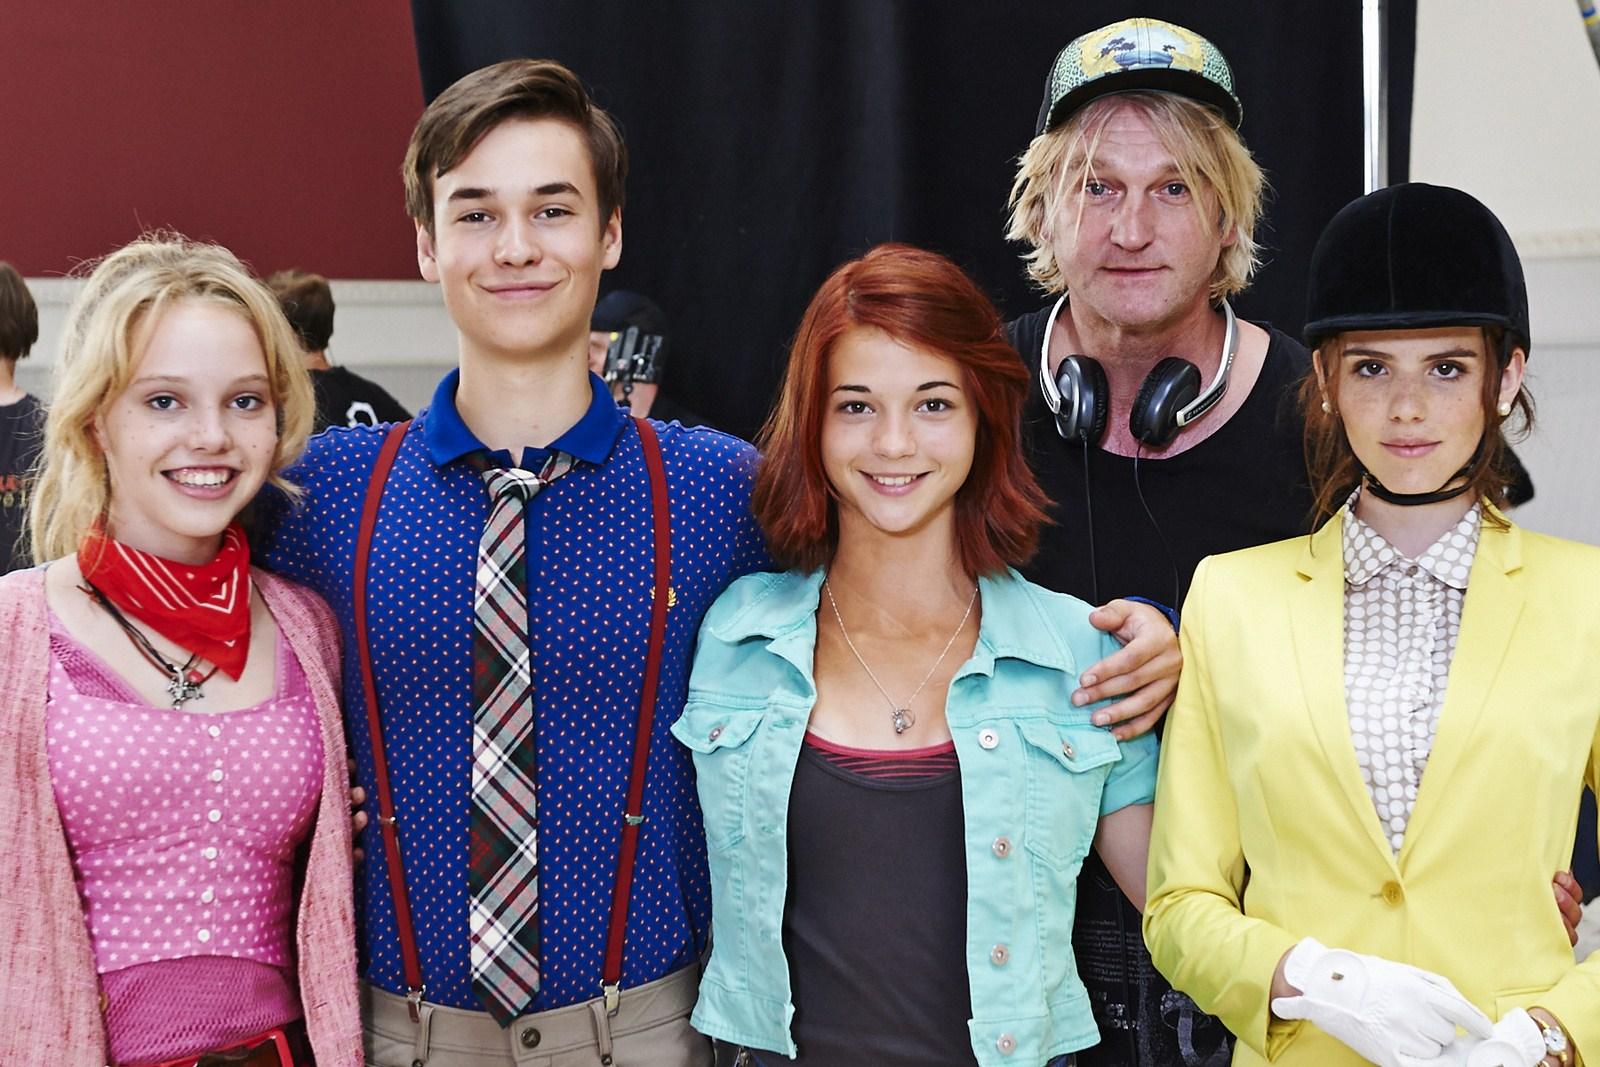 Bibi Und Tina 4 Casting